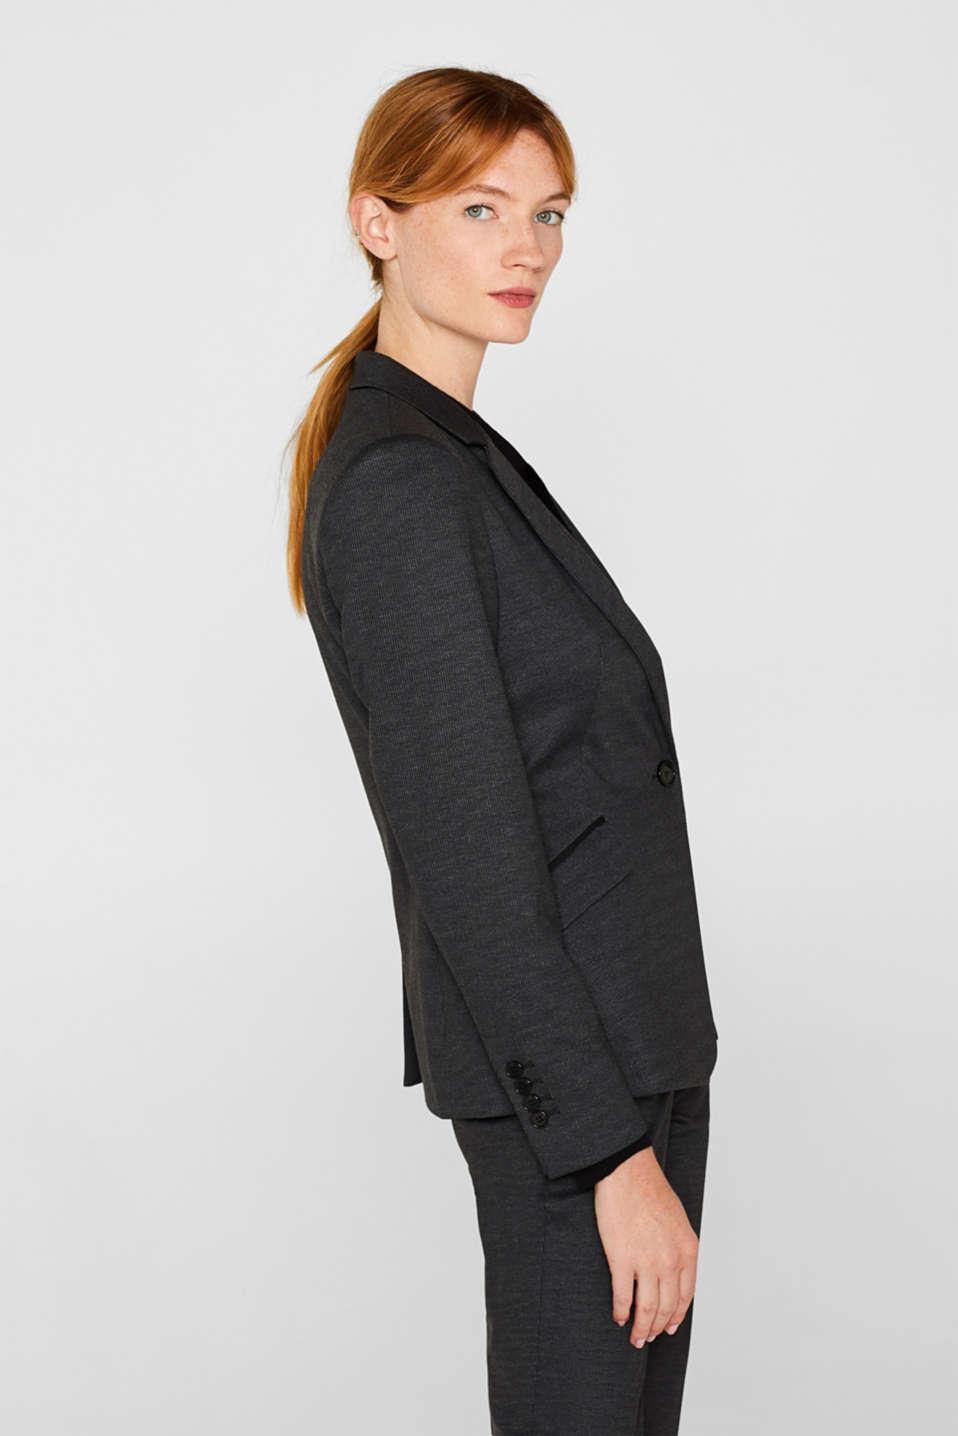 MINI CHECK mix + match stretch blazer, ANTHRACITE, detail image number 5